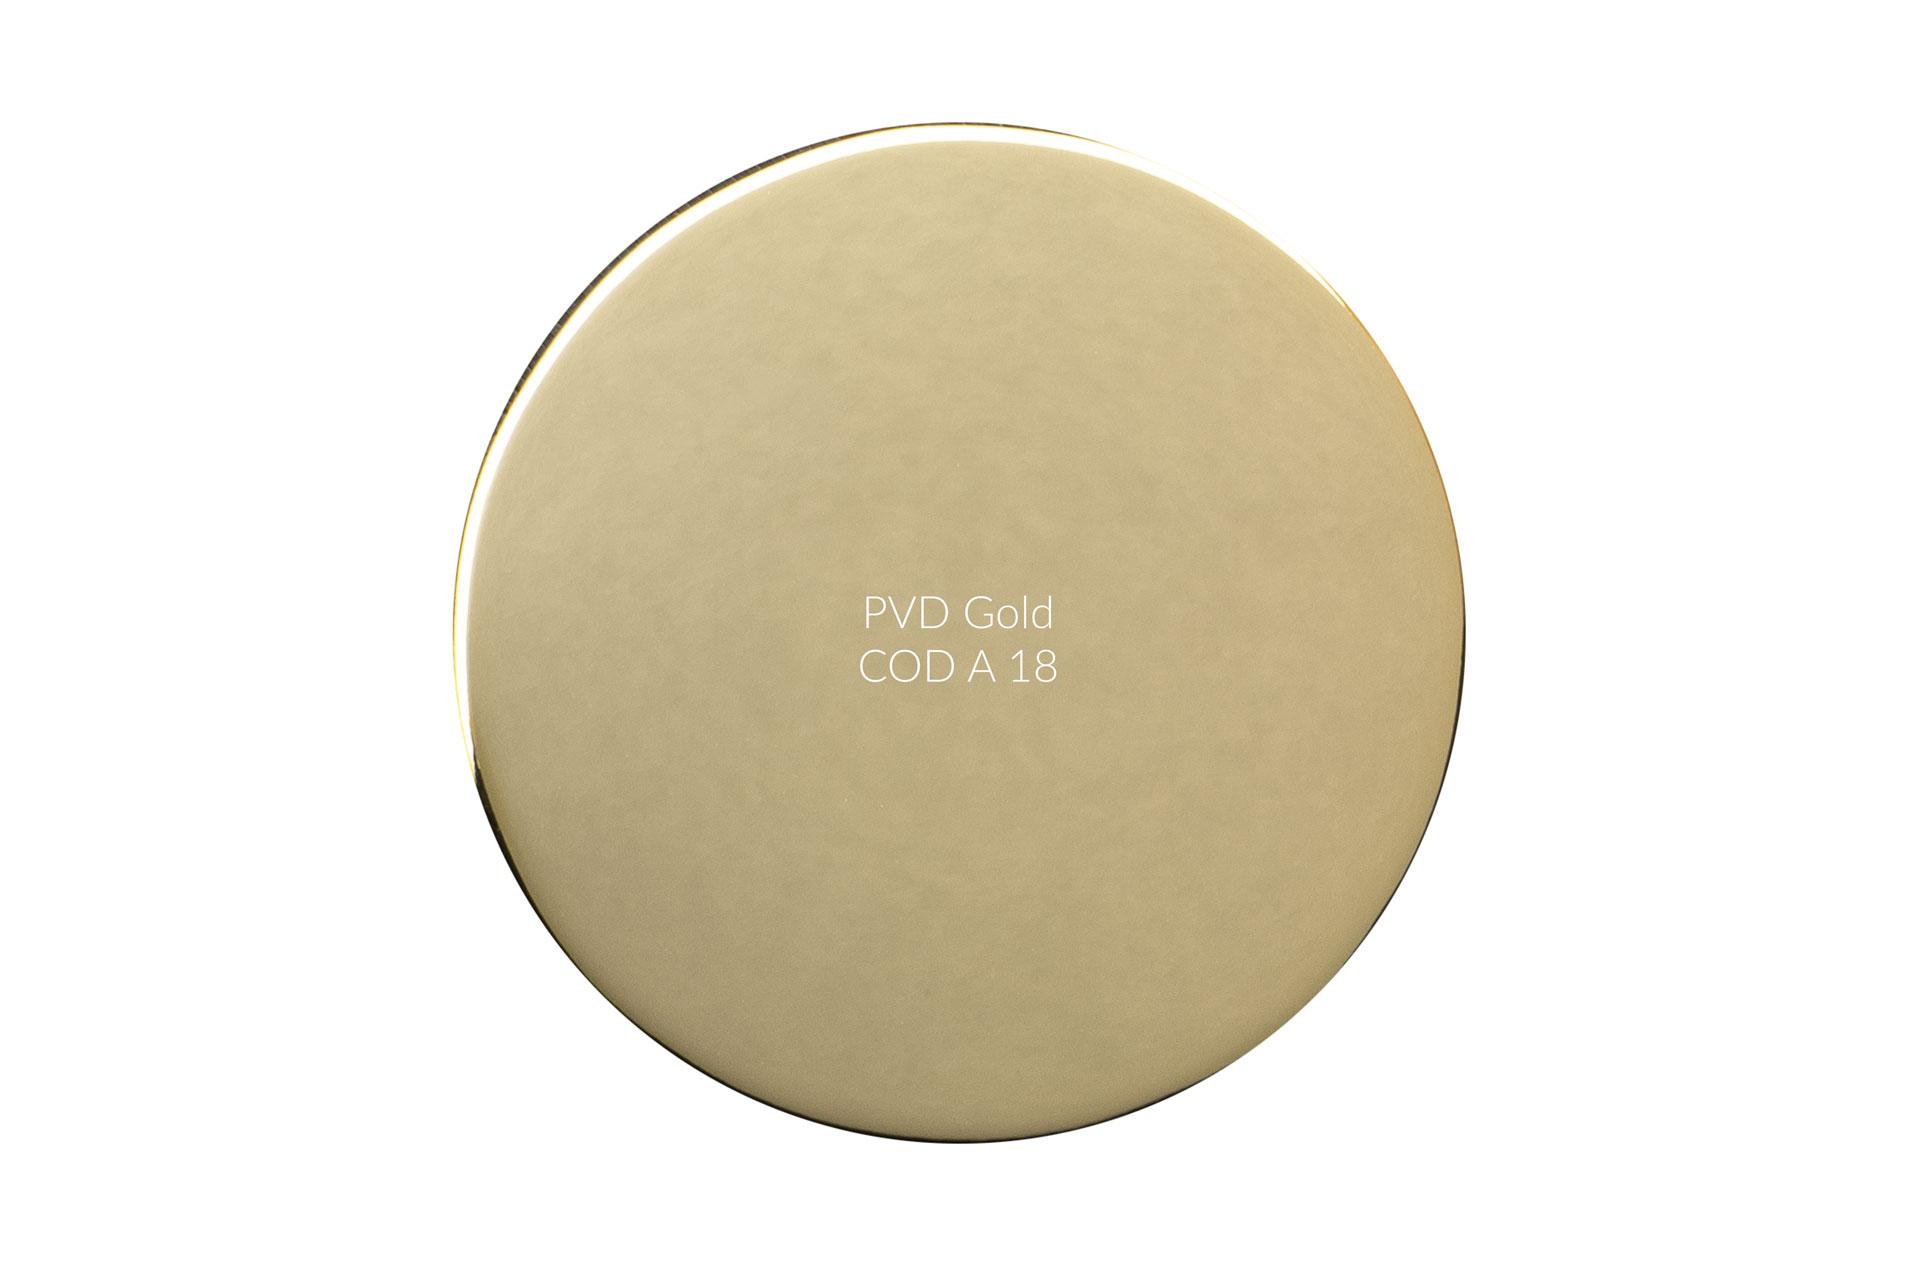 Dischetto PVD gold cod A 18 lucido